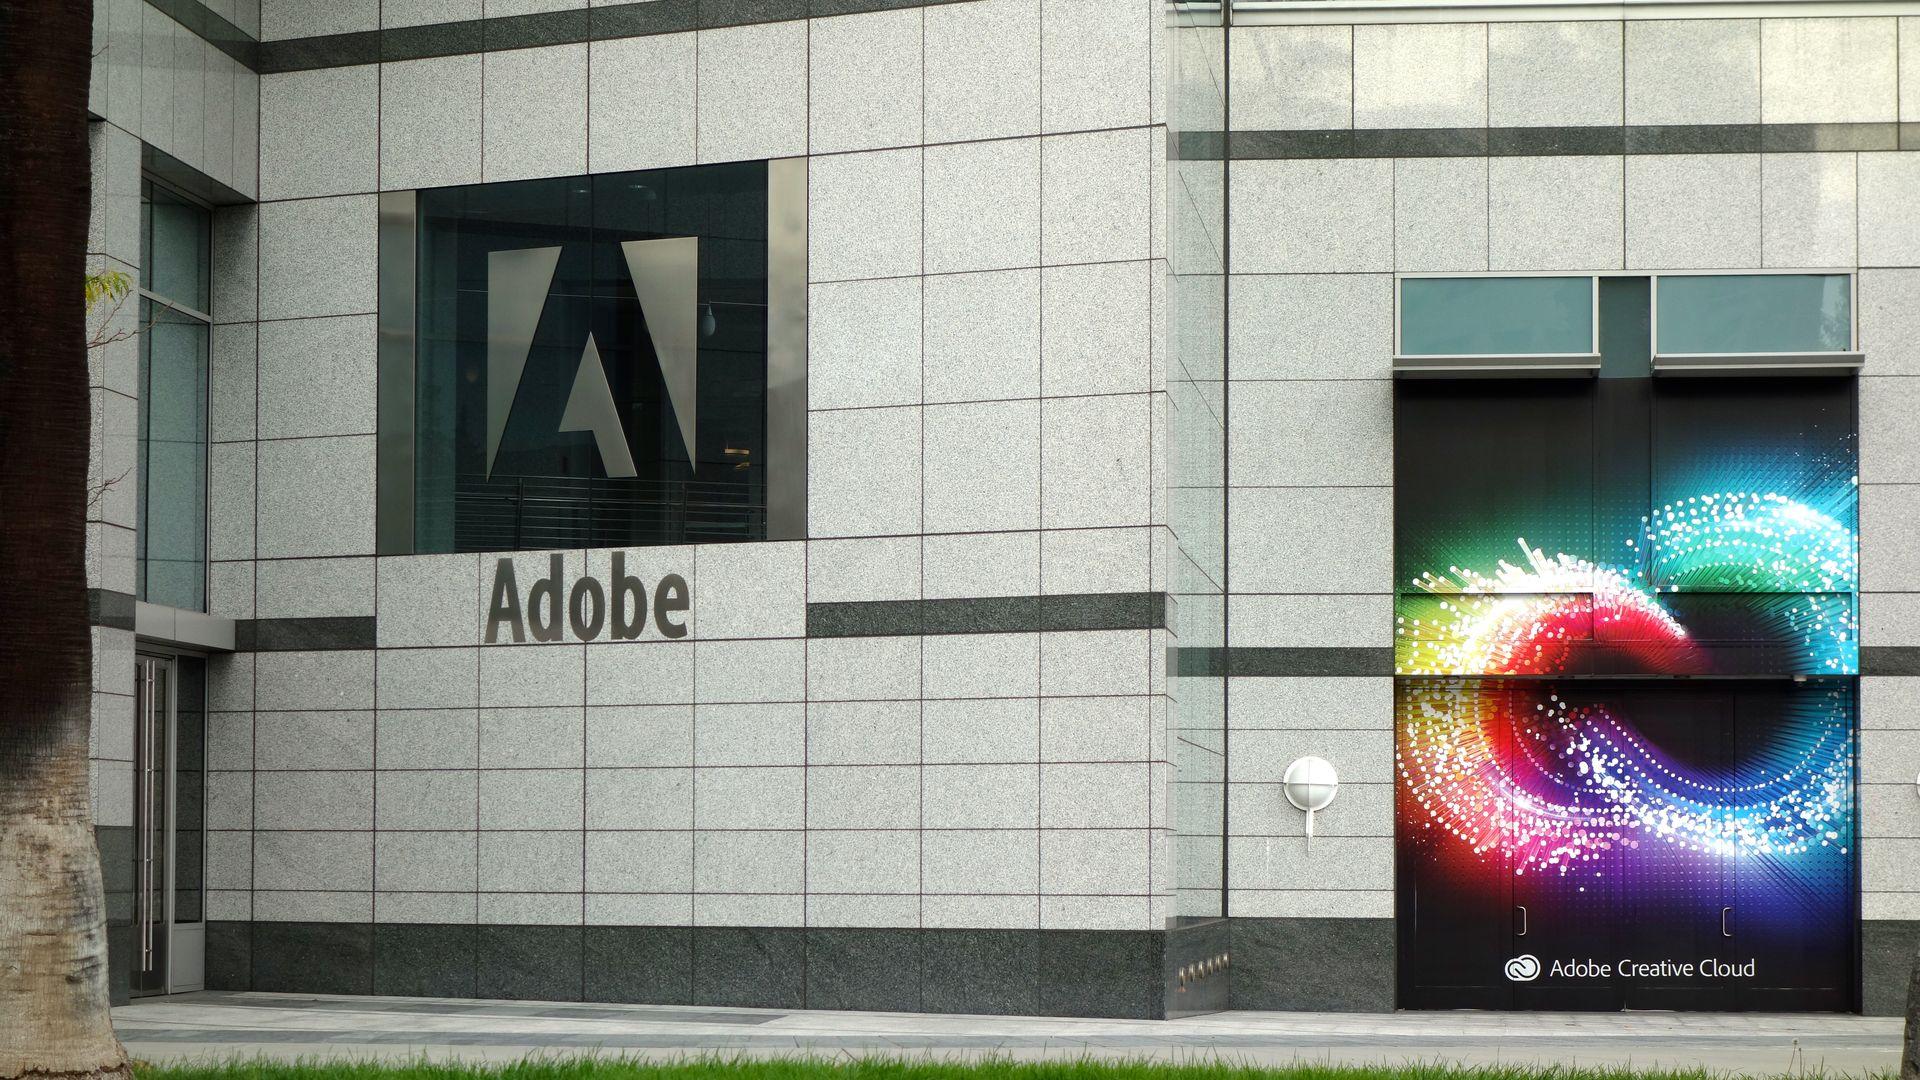 Adobe logo on an exterior wall